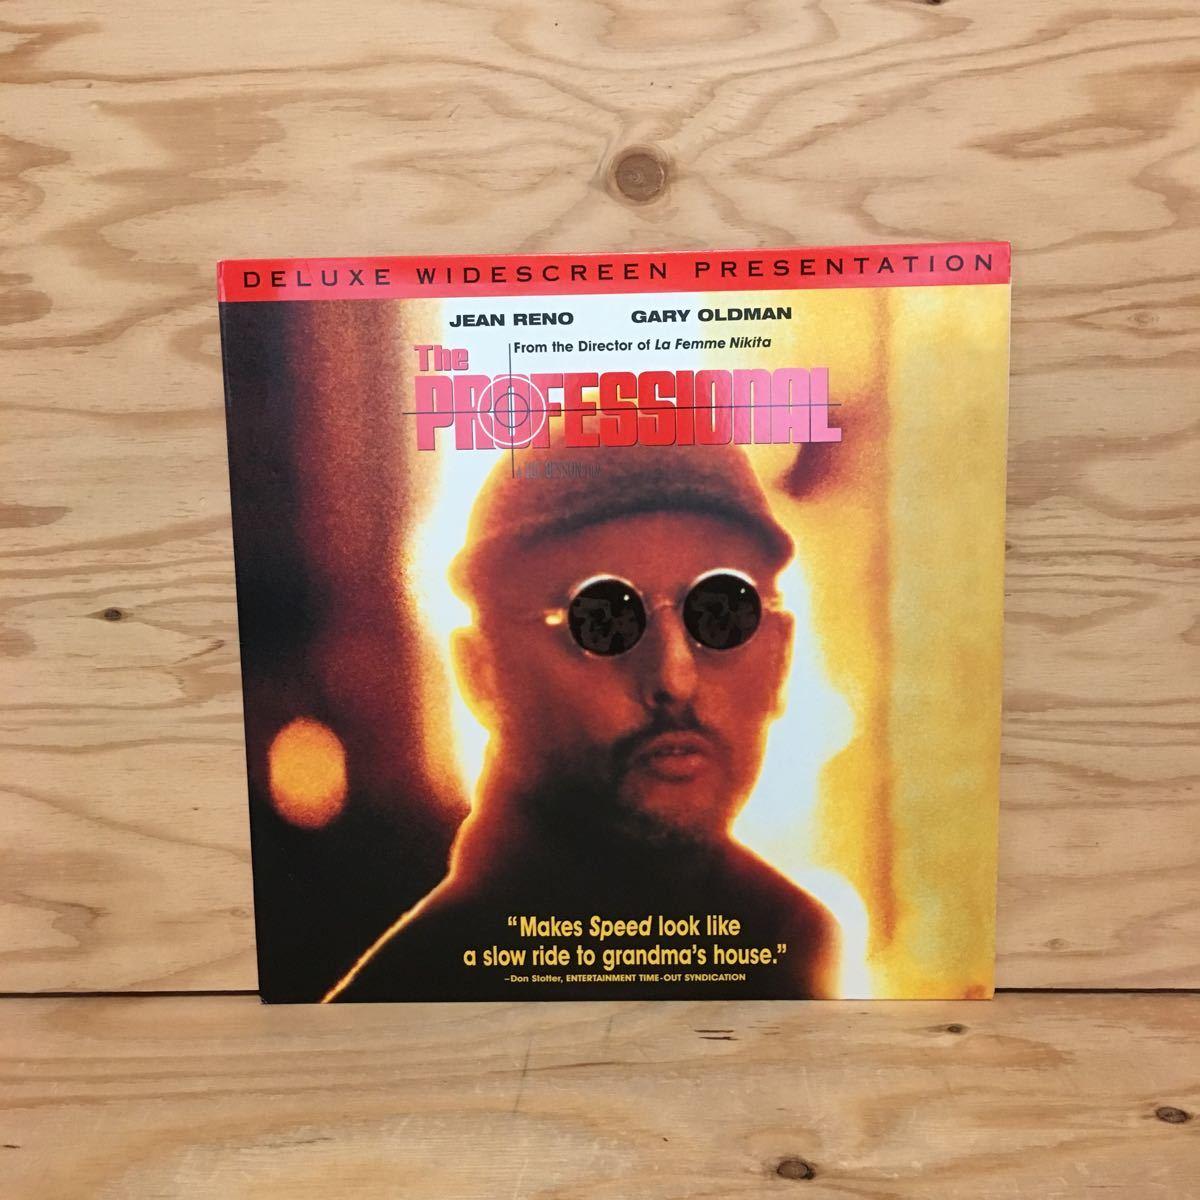 ◎Y3FIIA-200221 レア[THE PROFESSIONAL 輸入盤]LD レーザーディスク JEAN RENO LUC BESSON ワイドスクリーン_画像1